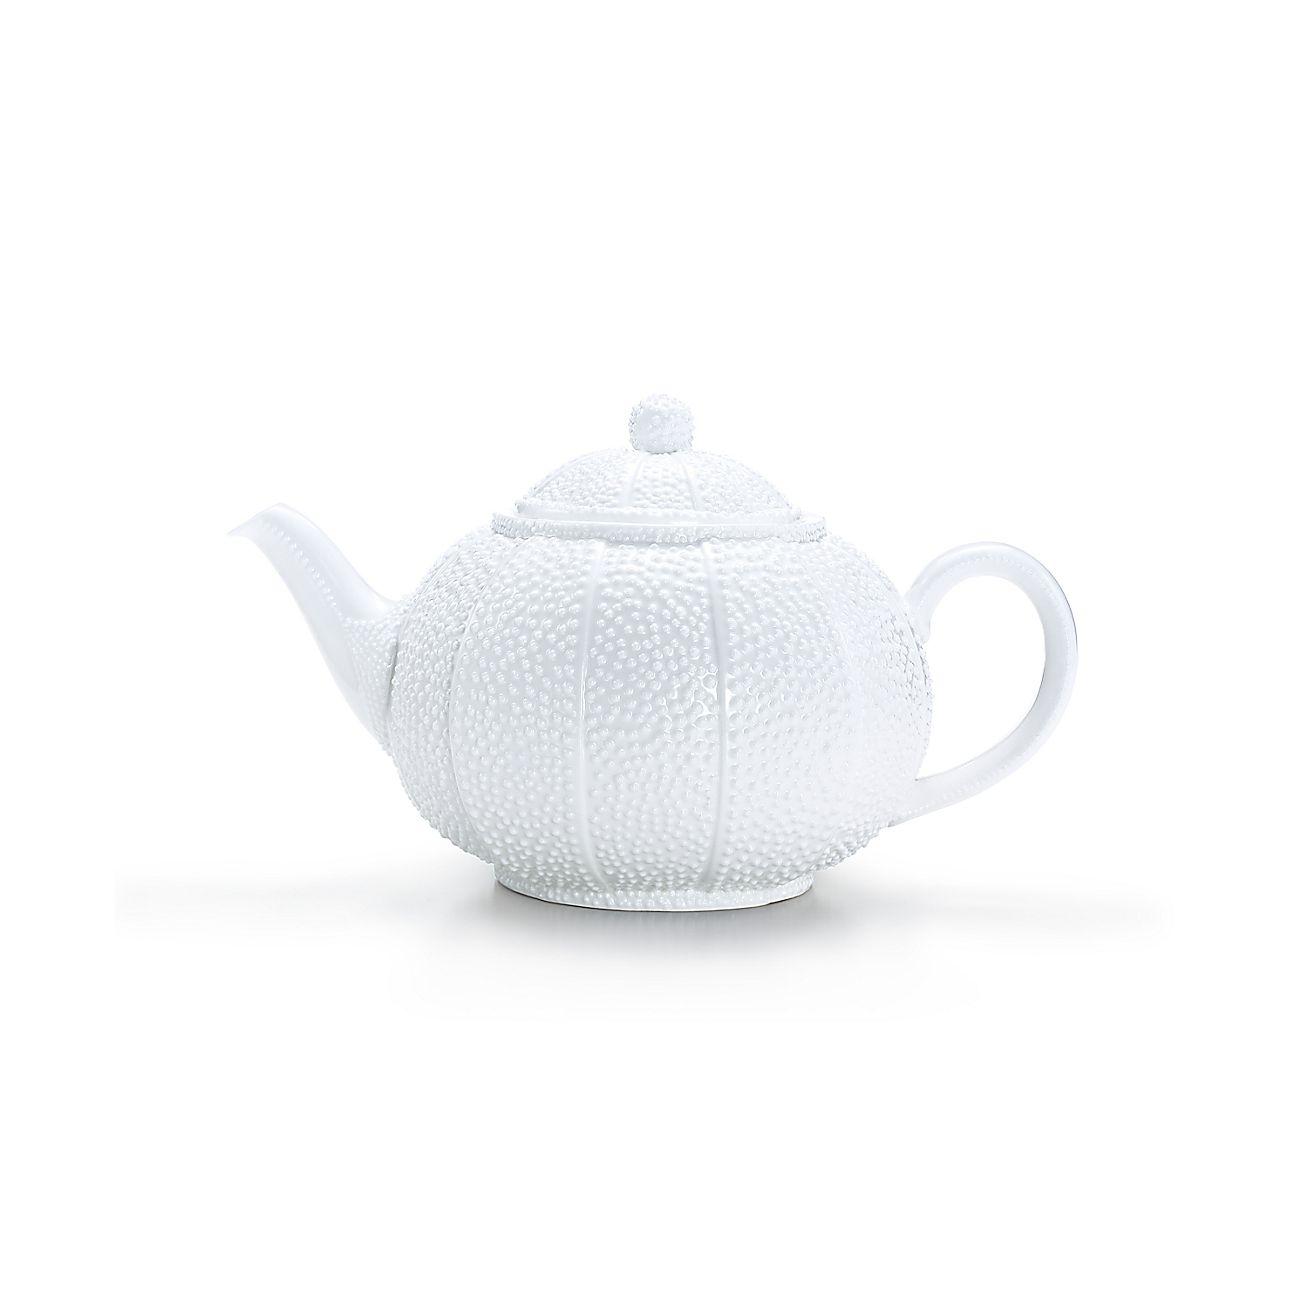 Sea Urchin:Teapot